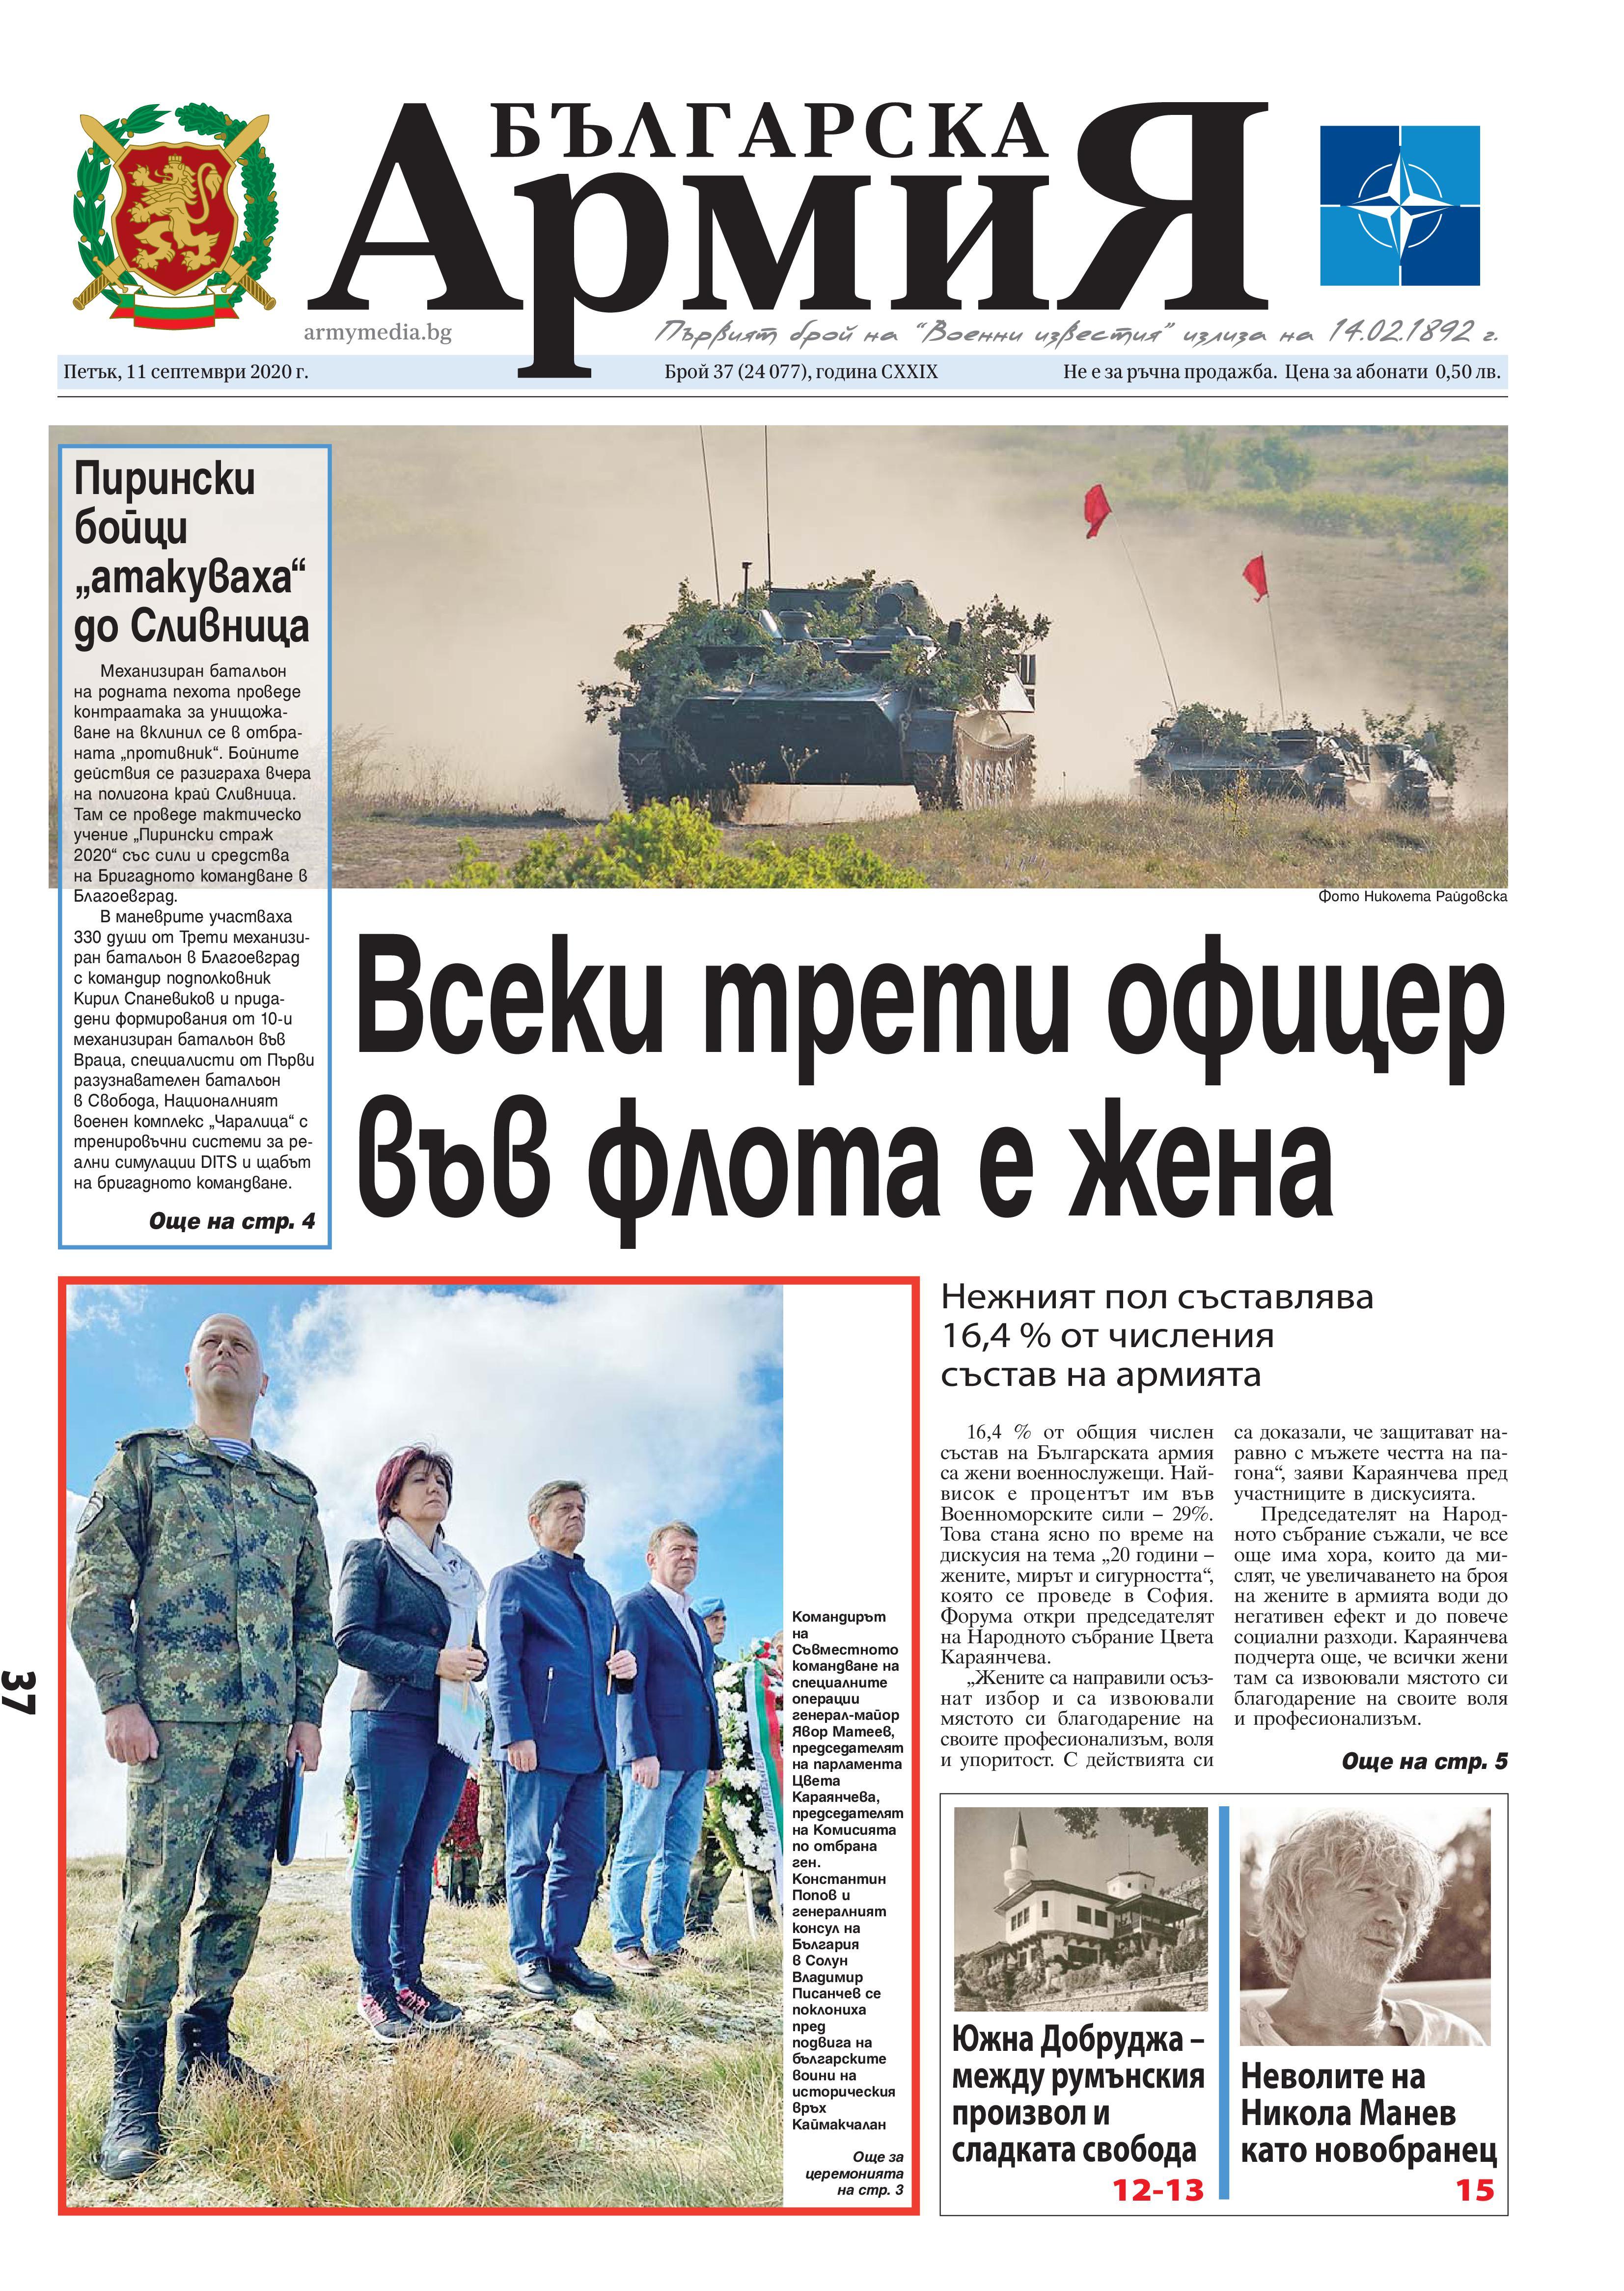 https://armymedia.bg/wp-content/uploads/2015/06/01-39.jpg